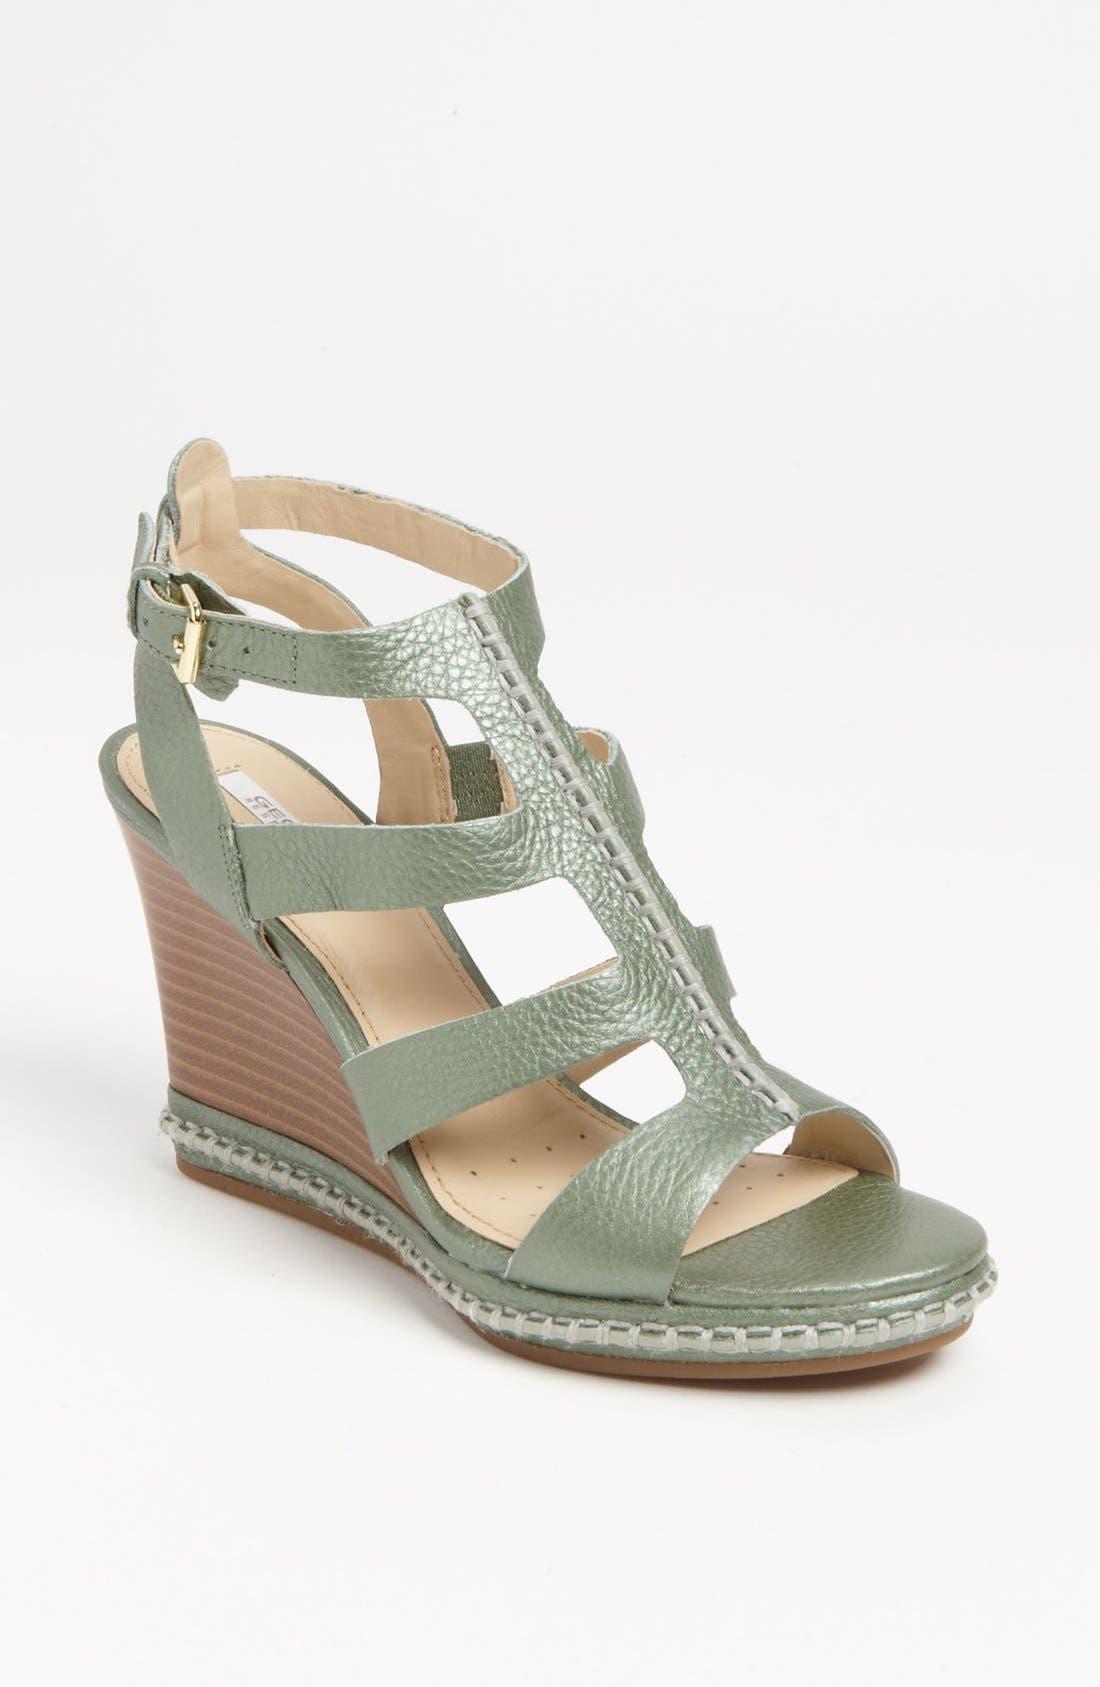 Main Image - Geox 'Sibilla' Sandal